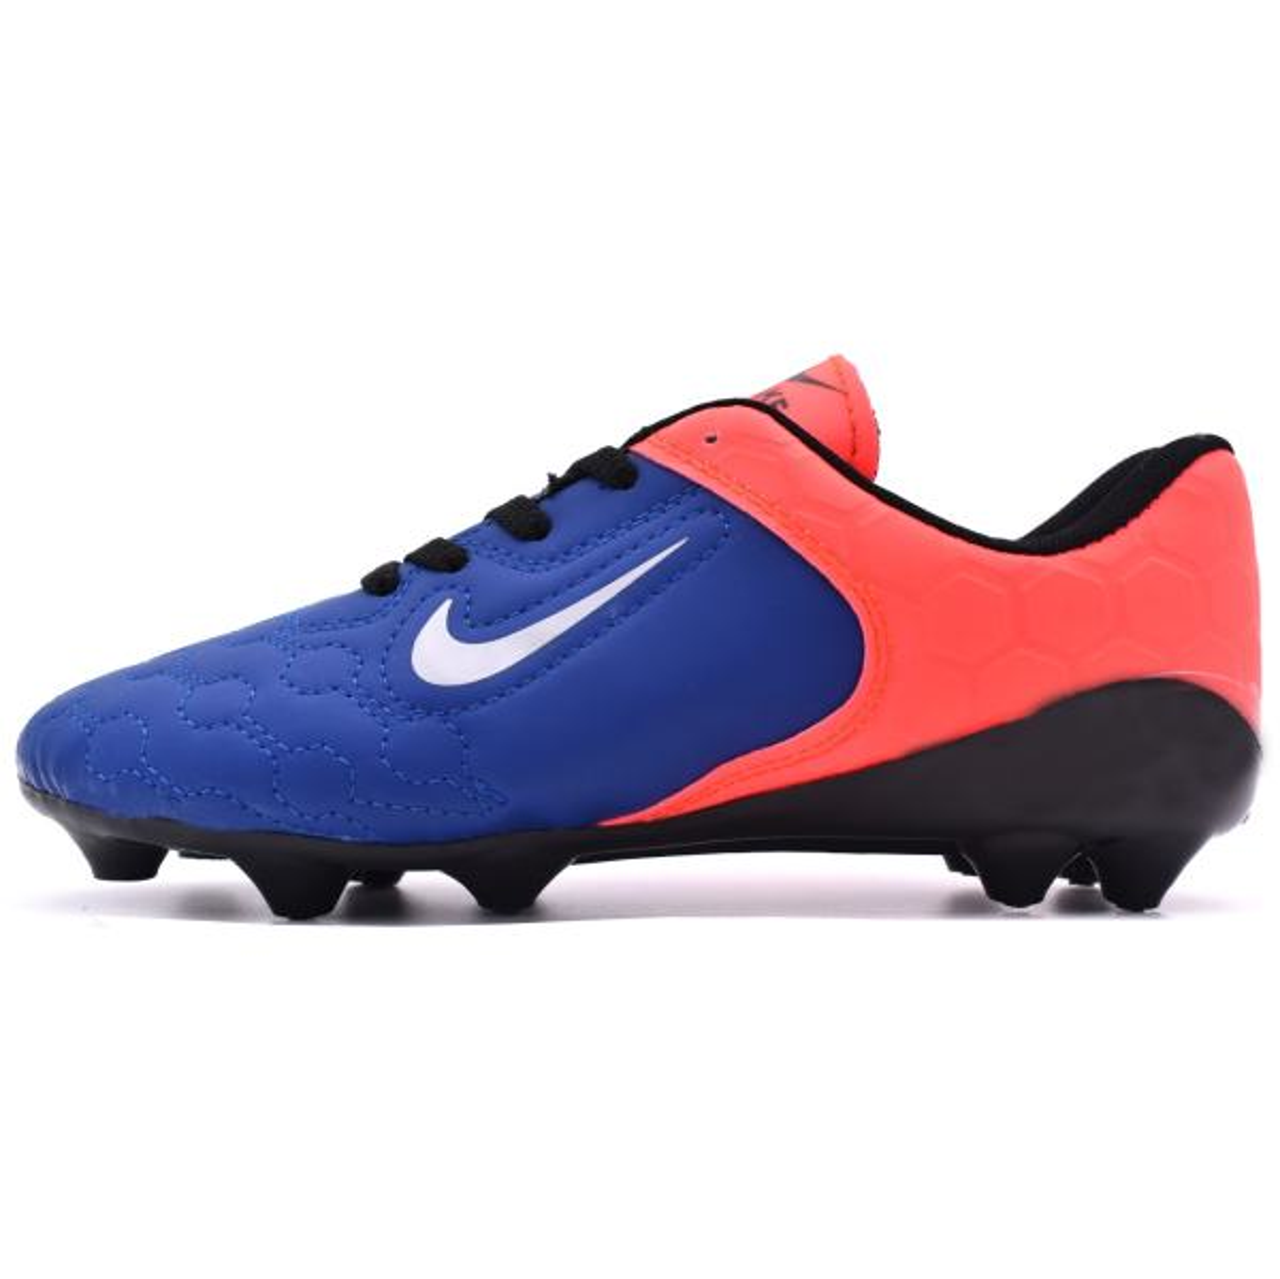 کفش فوتبال پسرانه مدل MAGISTA5 غیر اصل